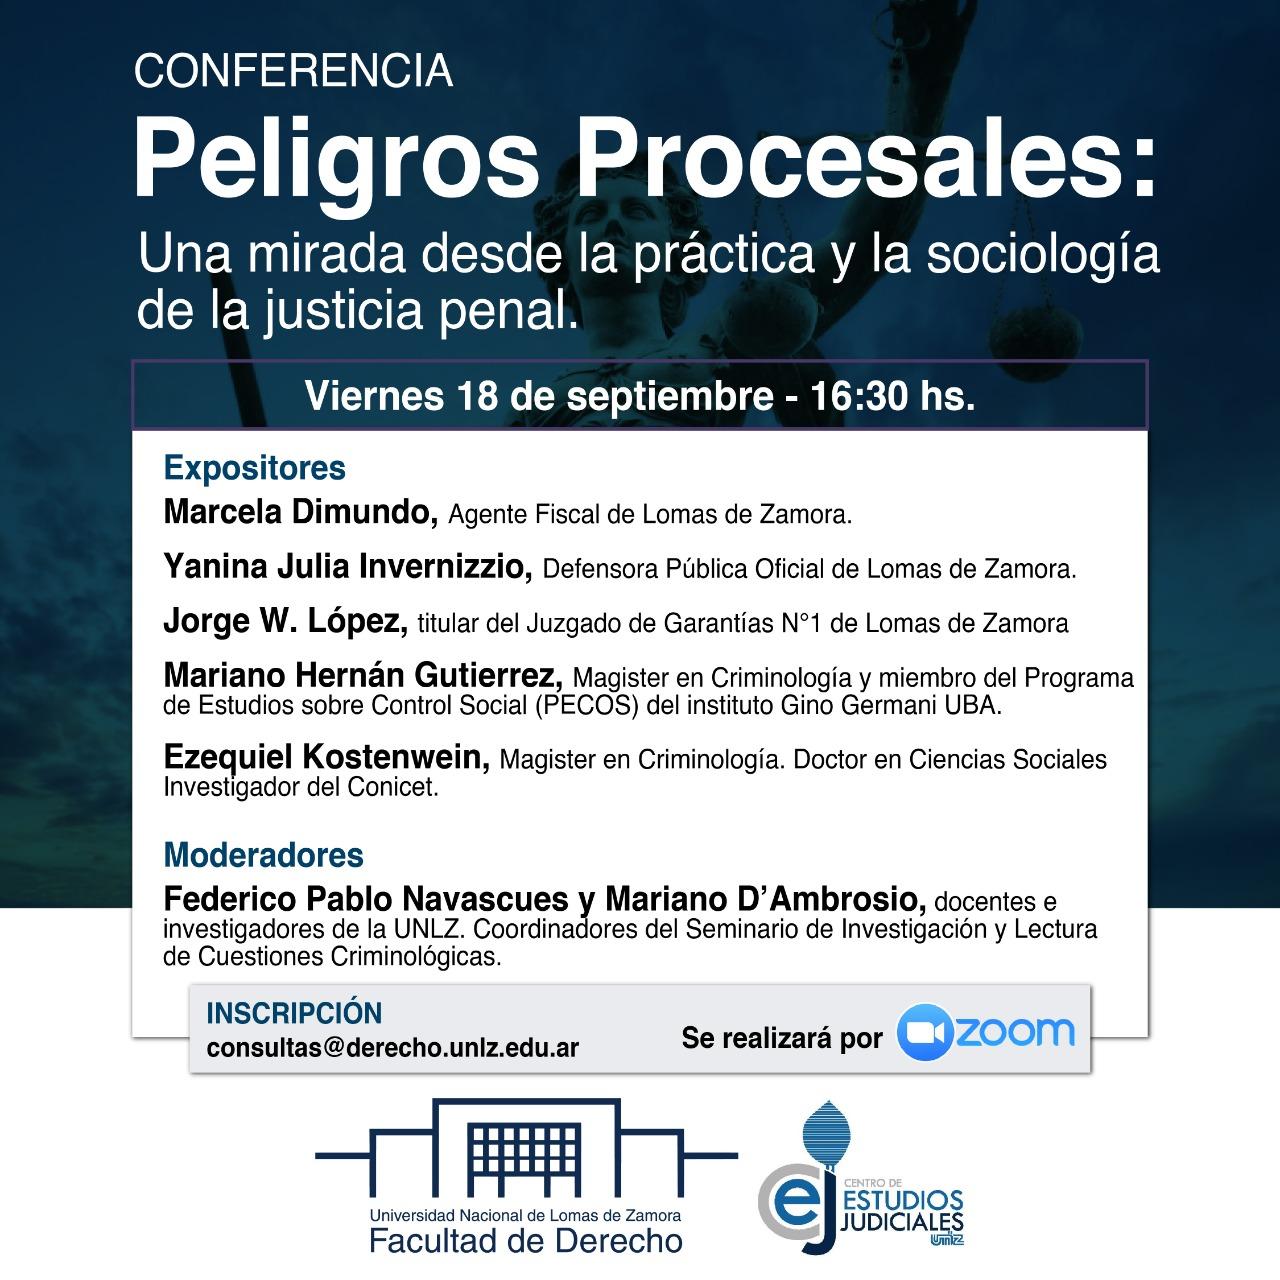 PELIGROS PROCESALES 18/9/2020